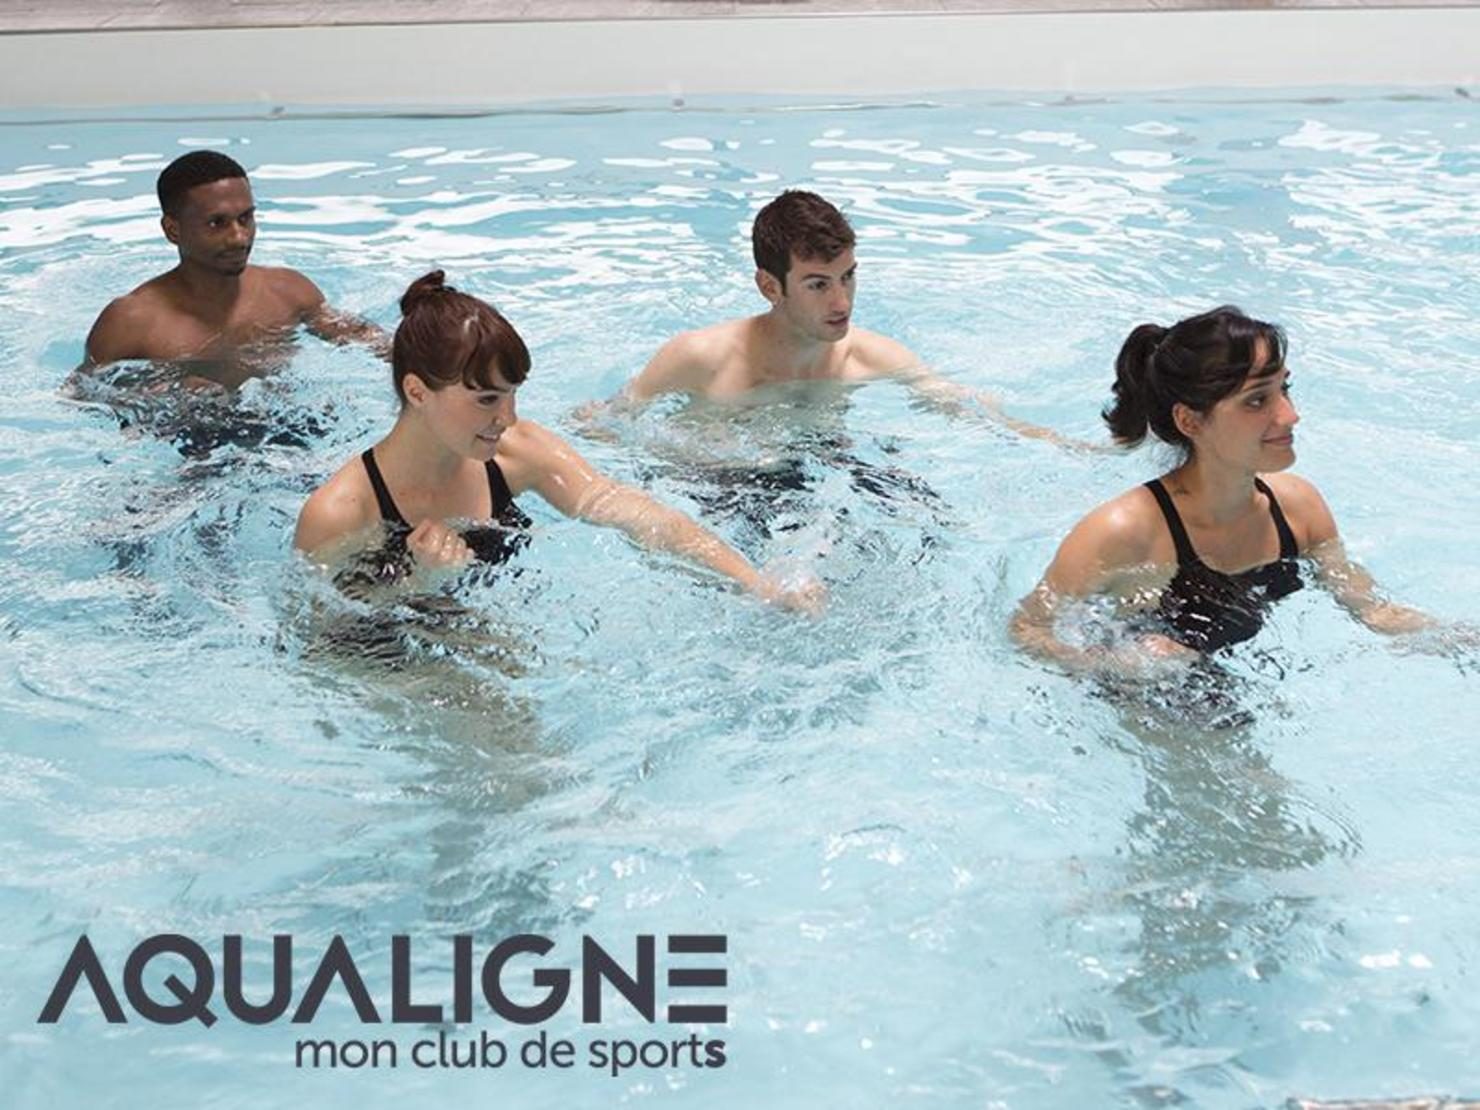 Aqualigne Mérignac